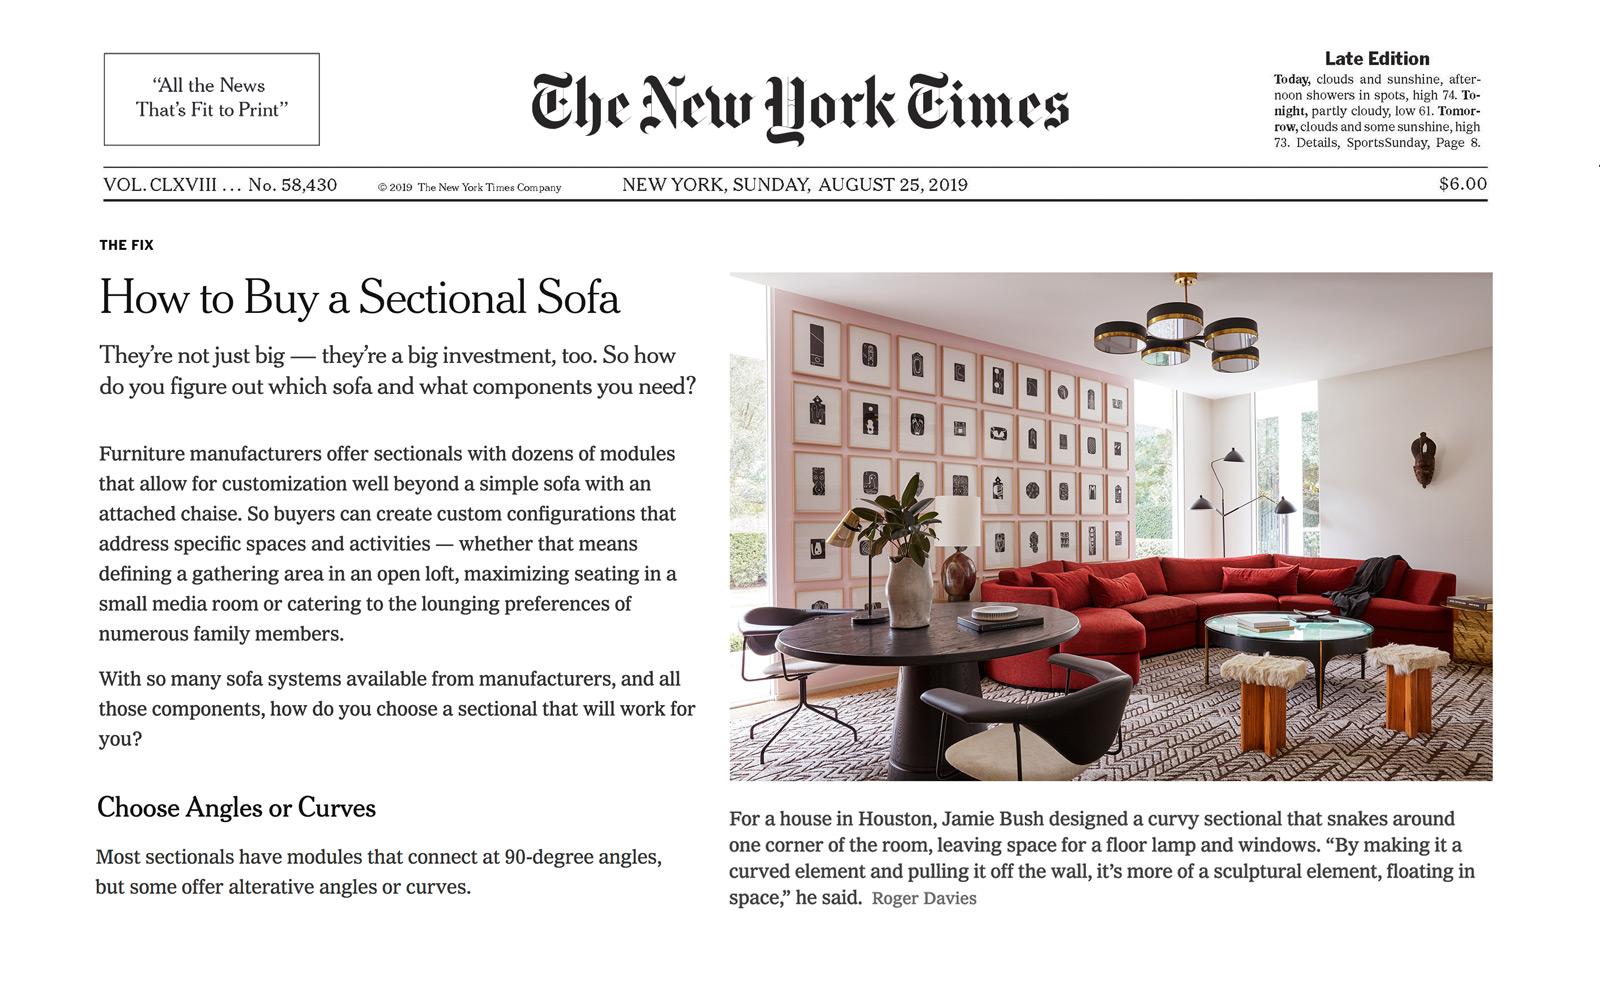 NYTImes-article-choosing-a-sectional-sofa-p1.jpg